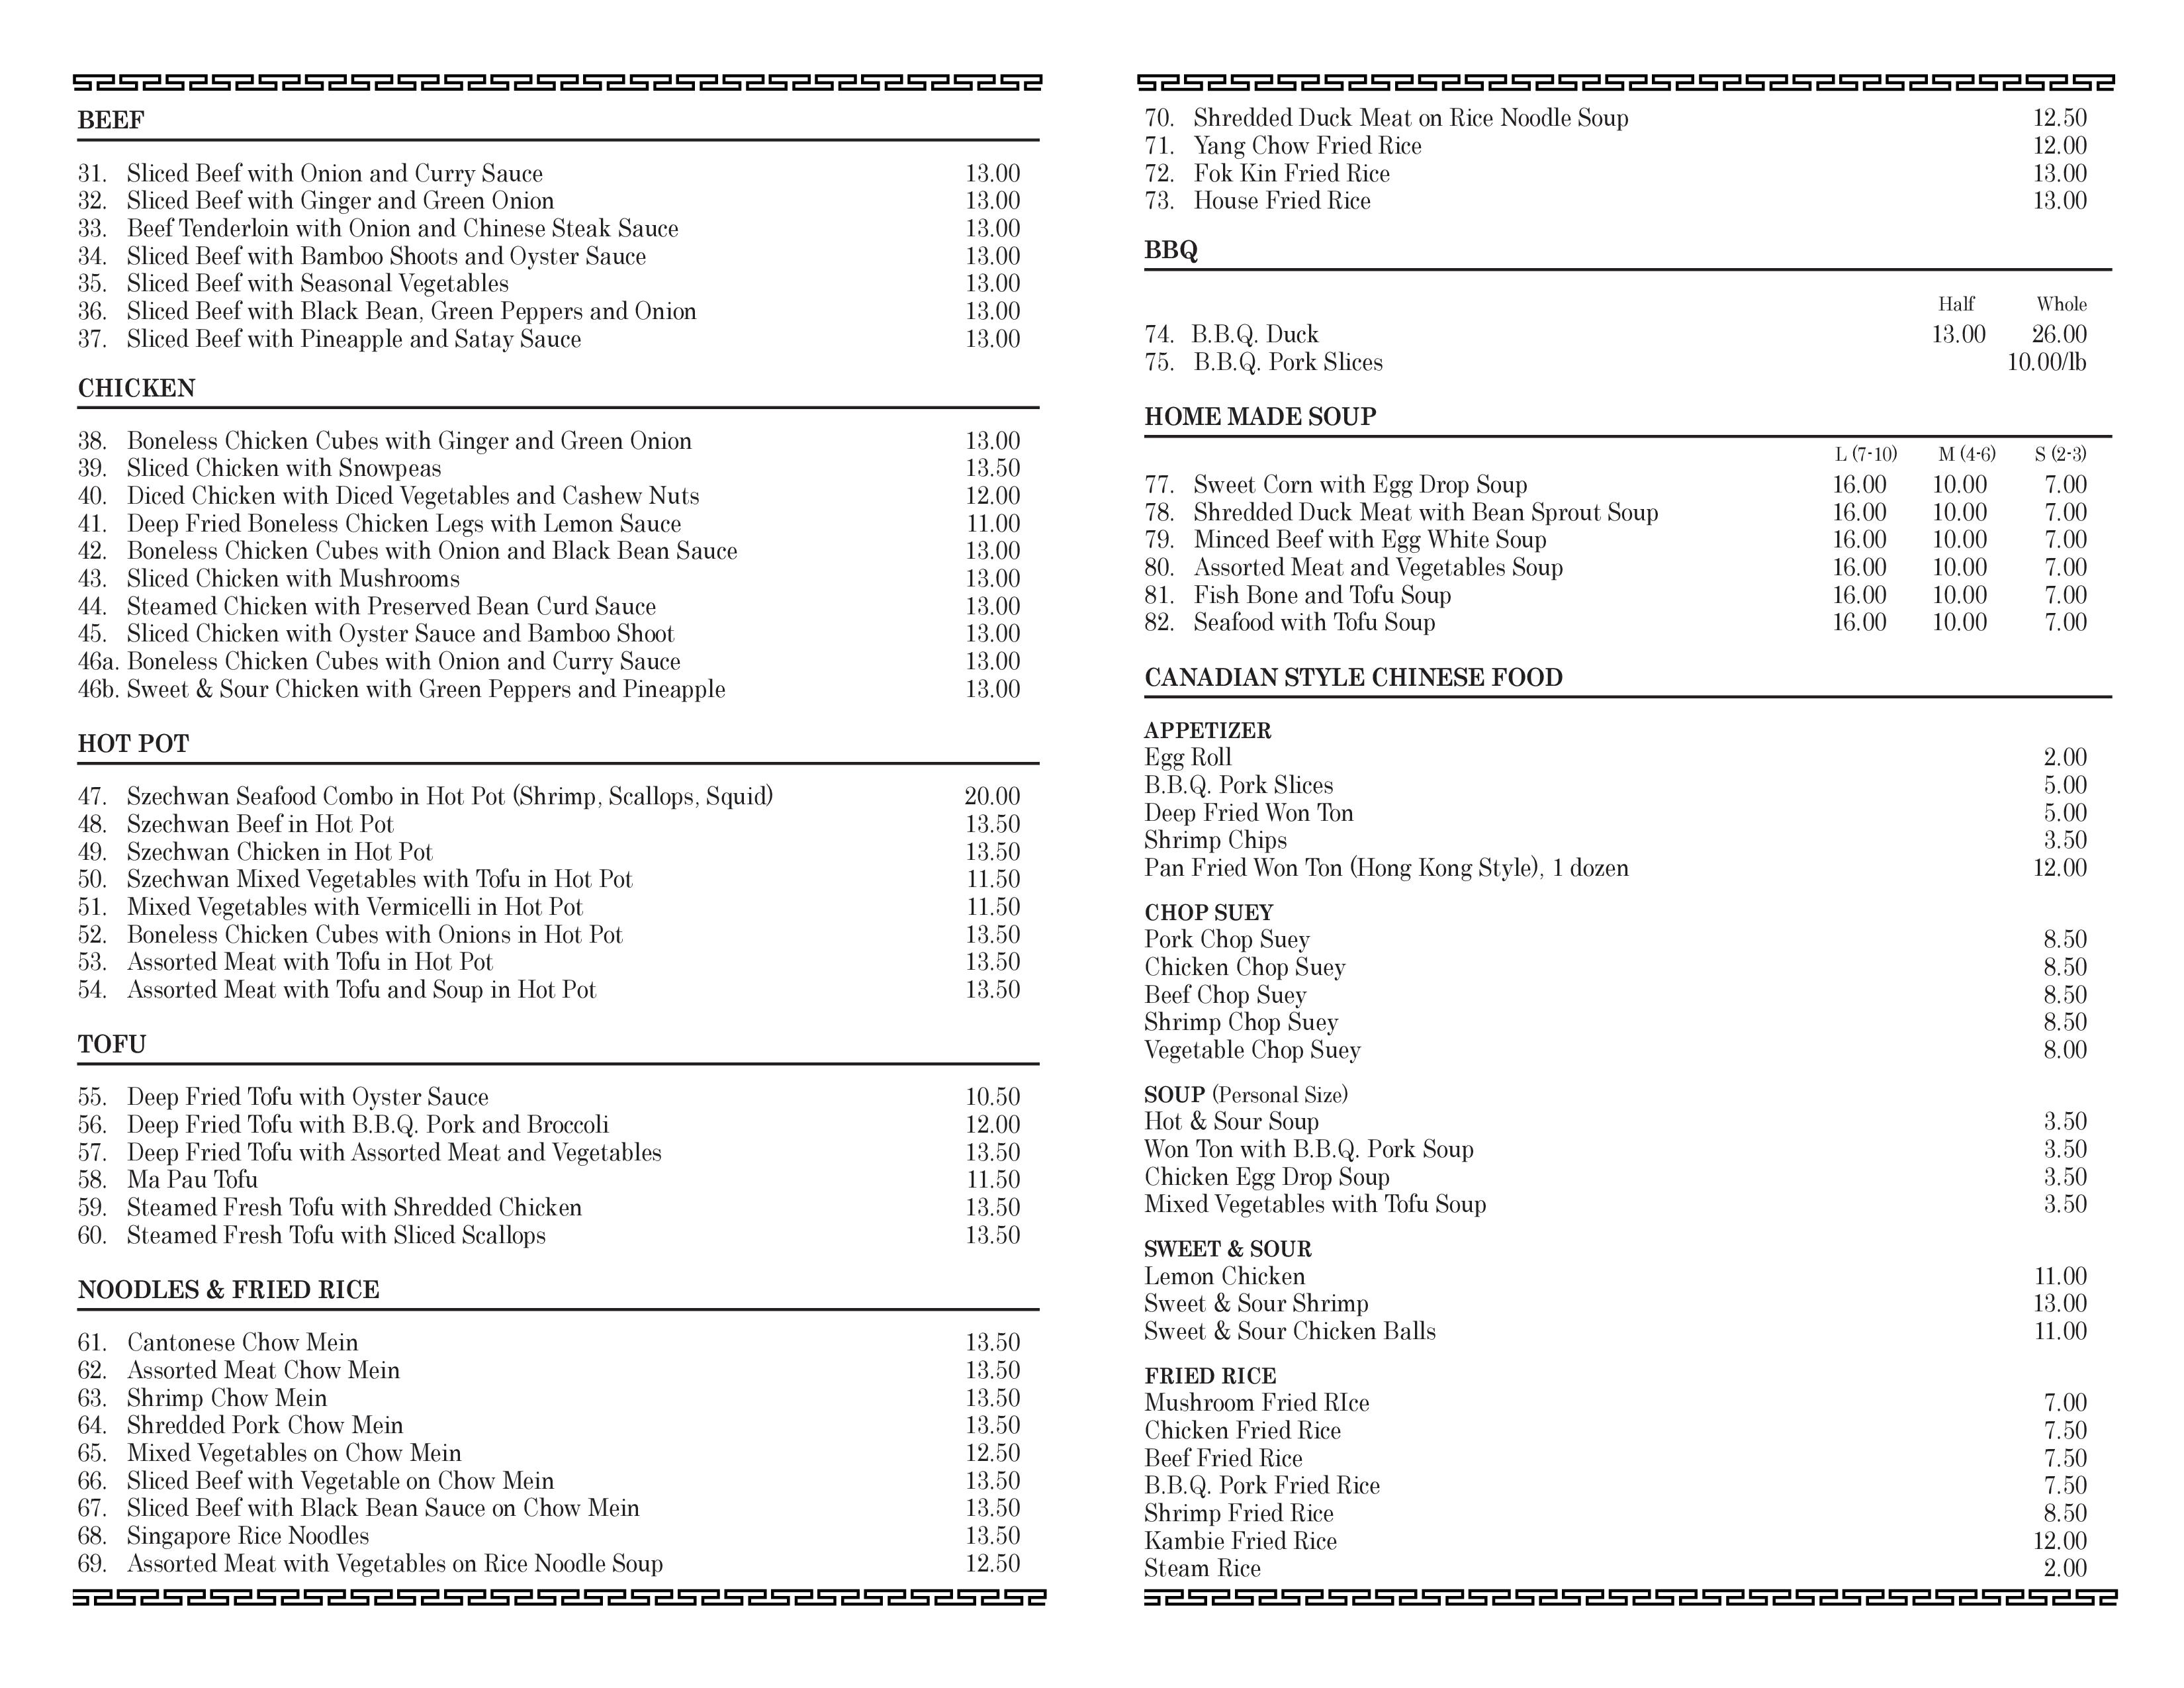 Mandarin Restaurant London Ontario Prices